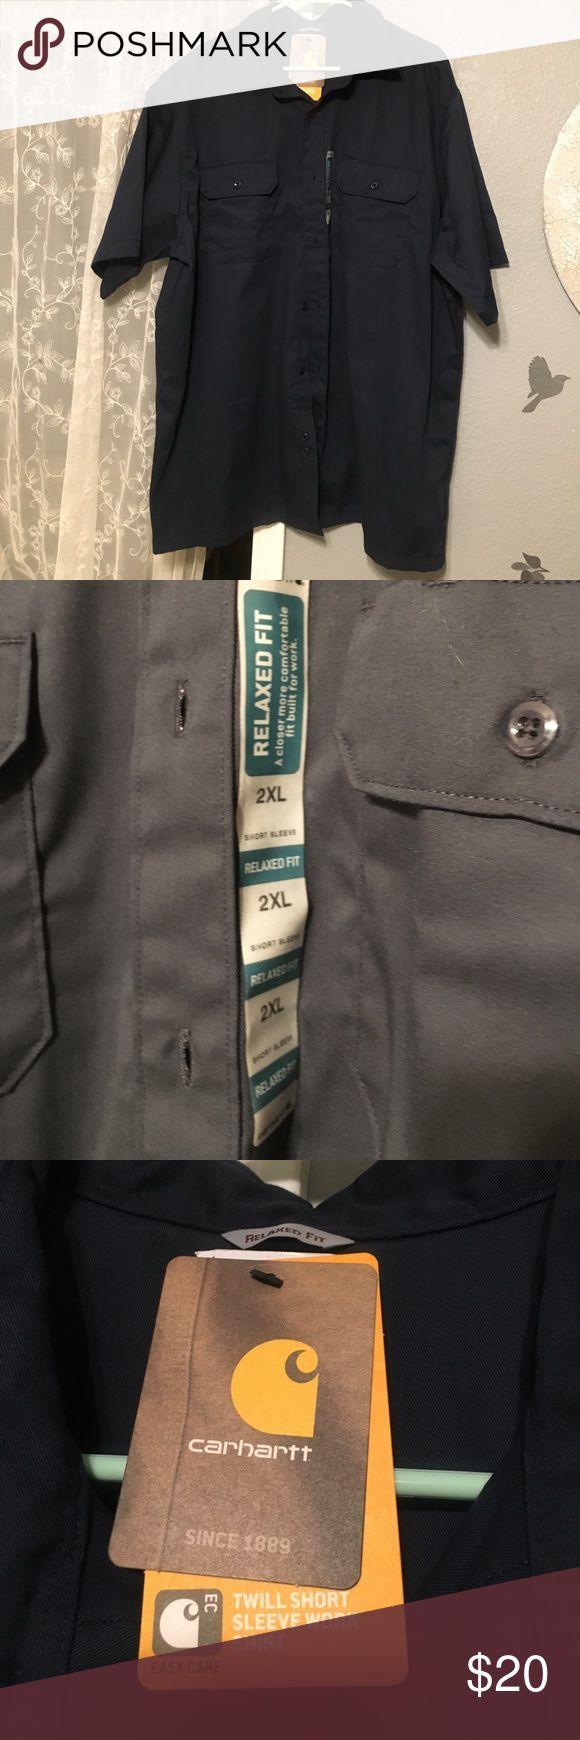 💪🏽Carhart Twill Work Shirt BNWT! Men's 2XL Navy Blue Work Shirt. Relaxed fit. Twill. Husband bought wrong size but never returned it...😏 Carhartt Shirts Casual Button Down Shirts